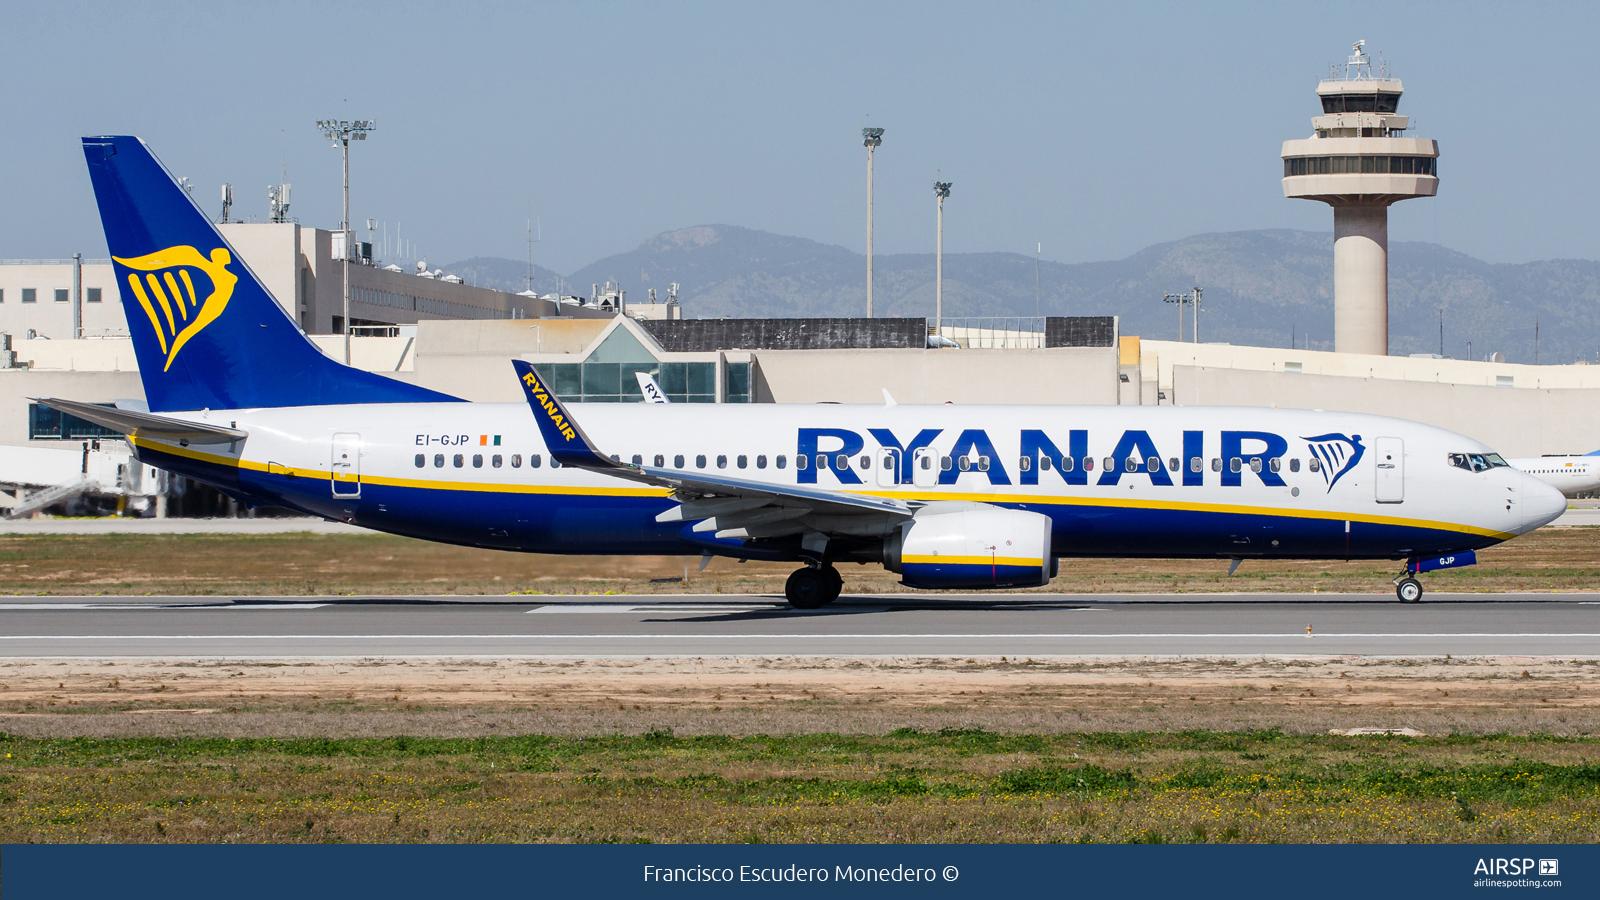 RyanairBoeing 737-800EI-GJP